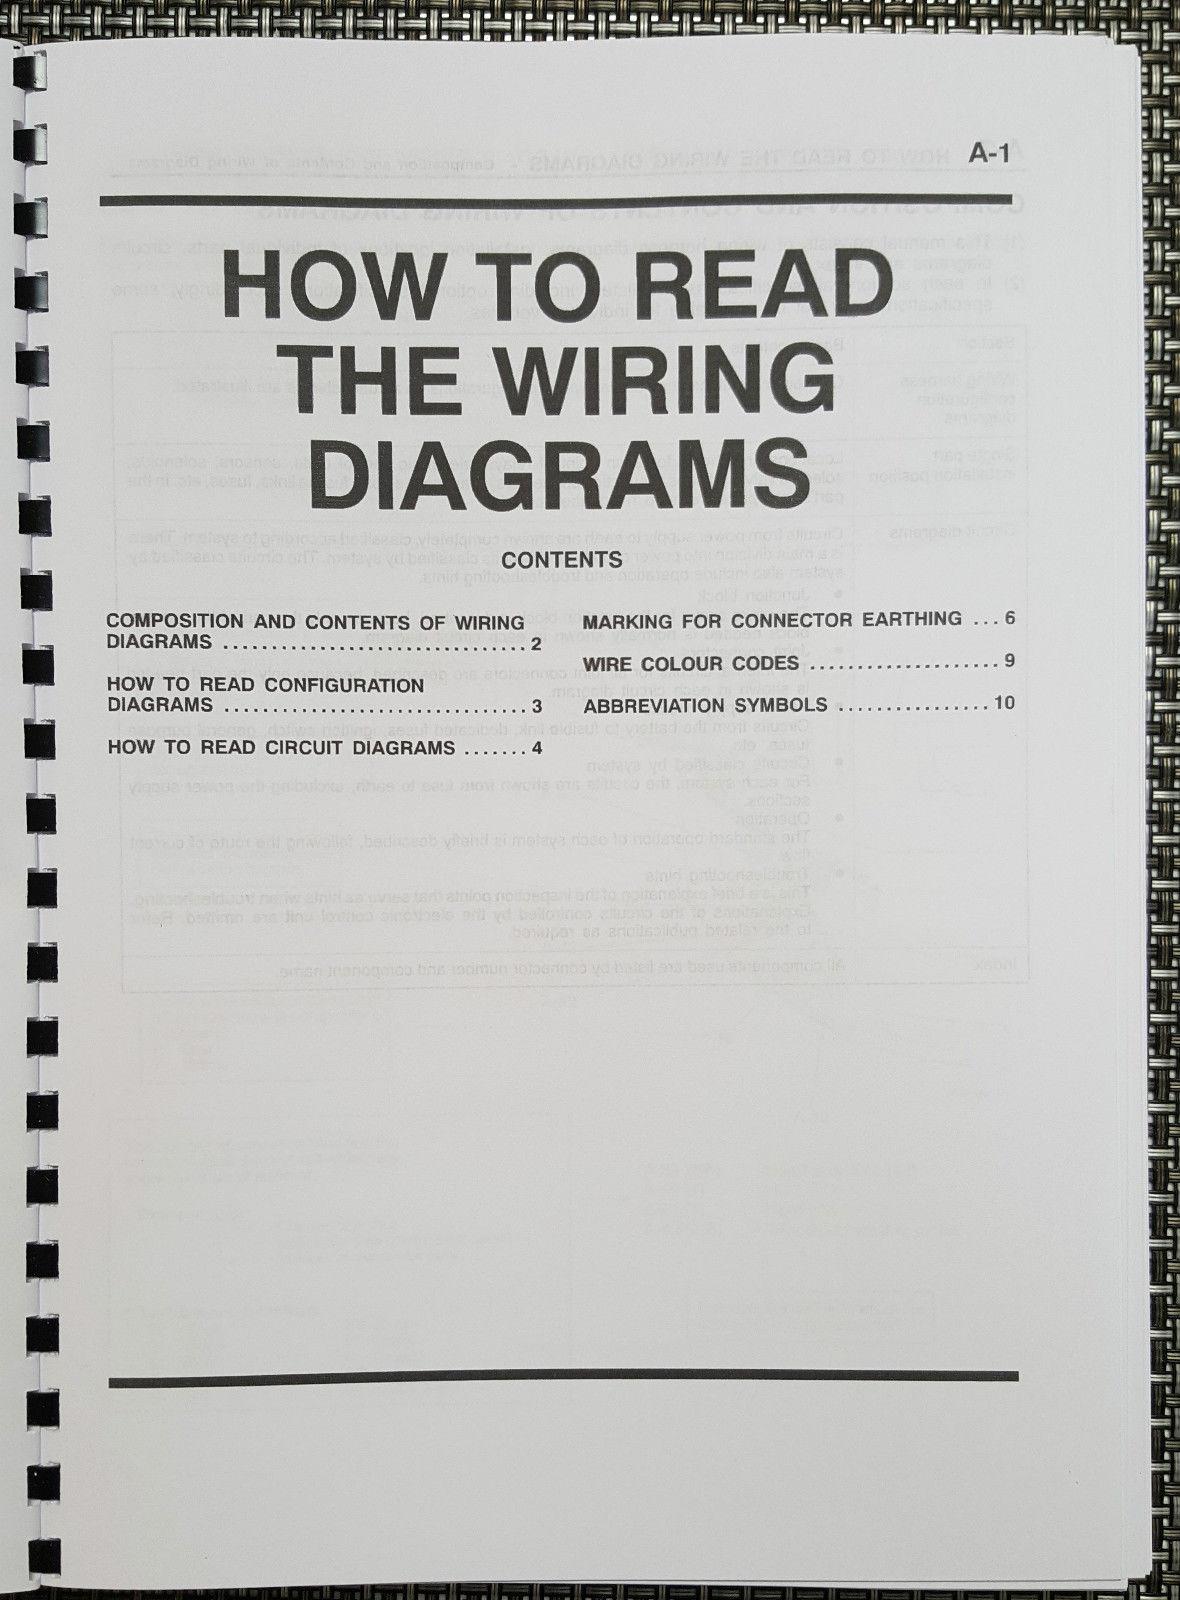 Mitsubishi Lancer Evo Vii Electrical Wiring And Similar Items Diagram Manual Reprinted Comb Bound